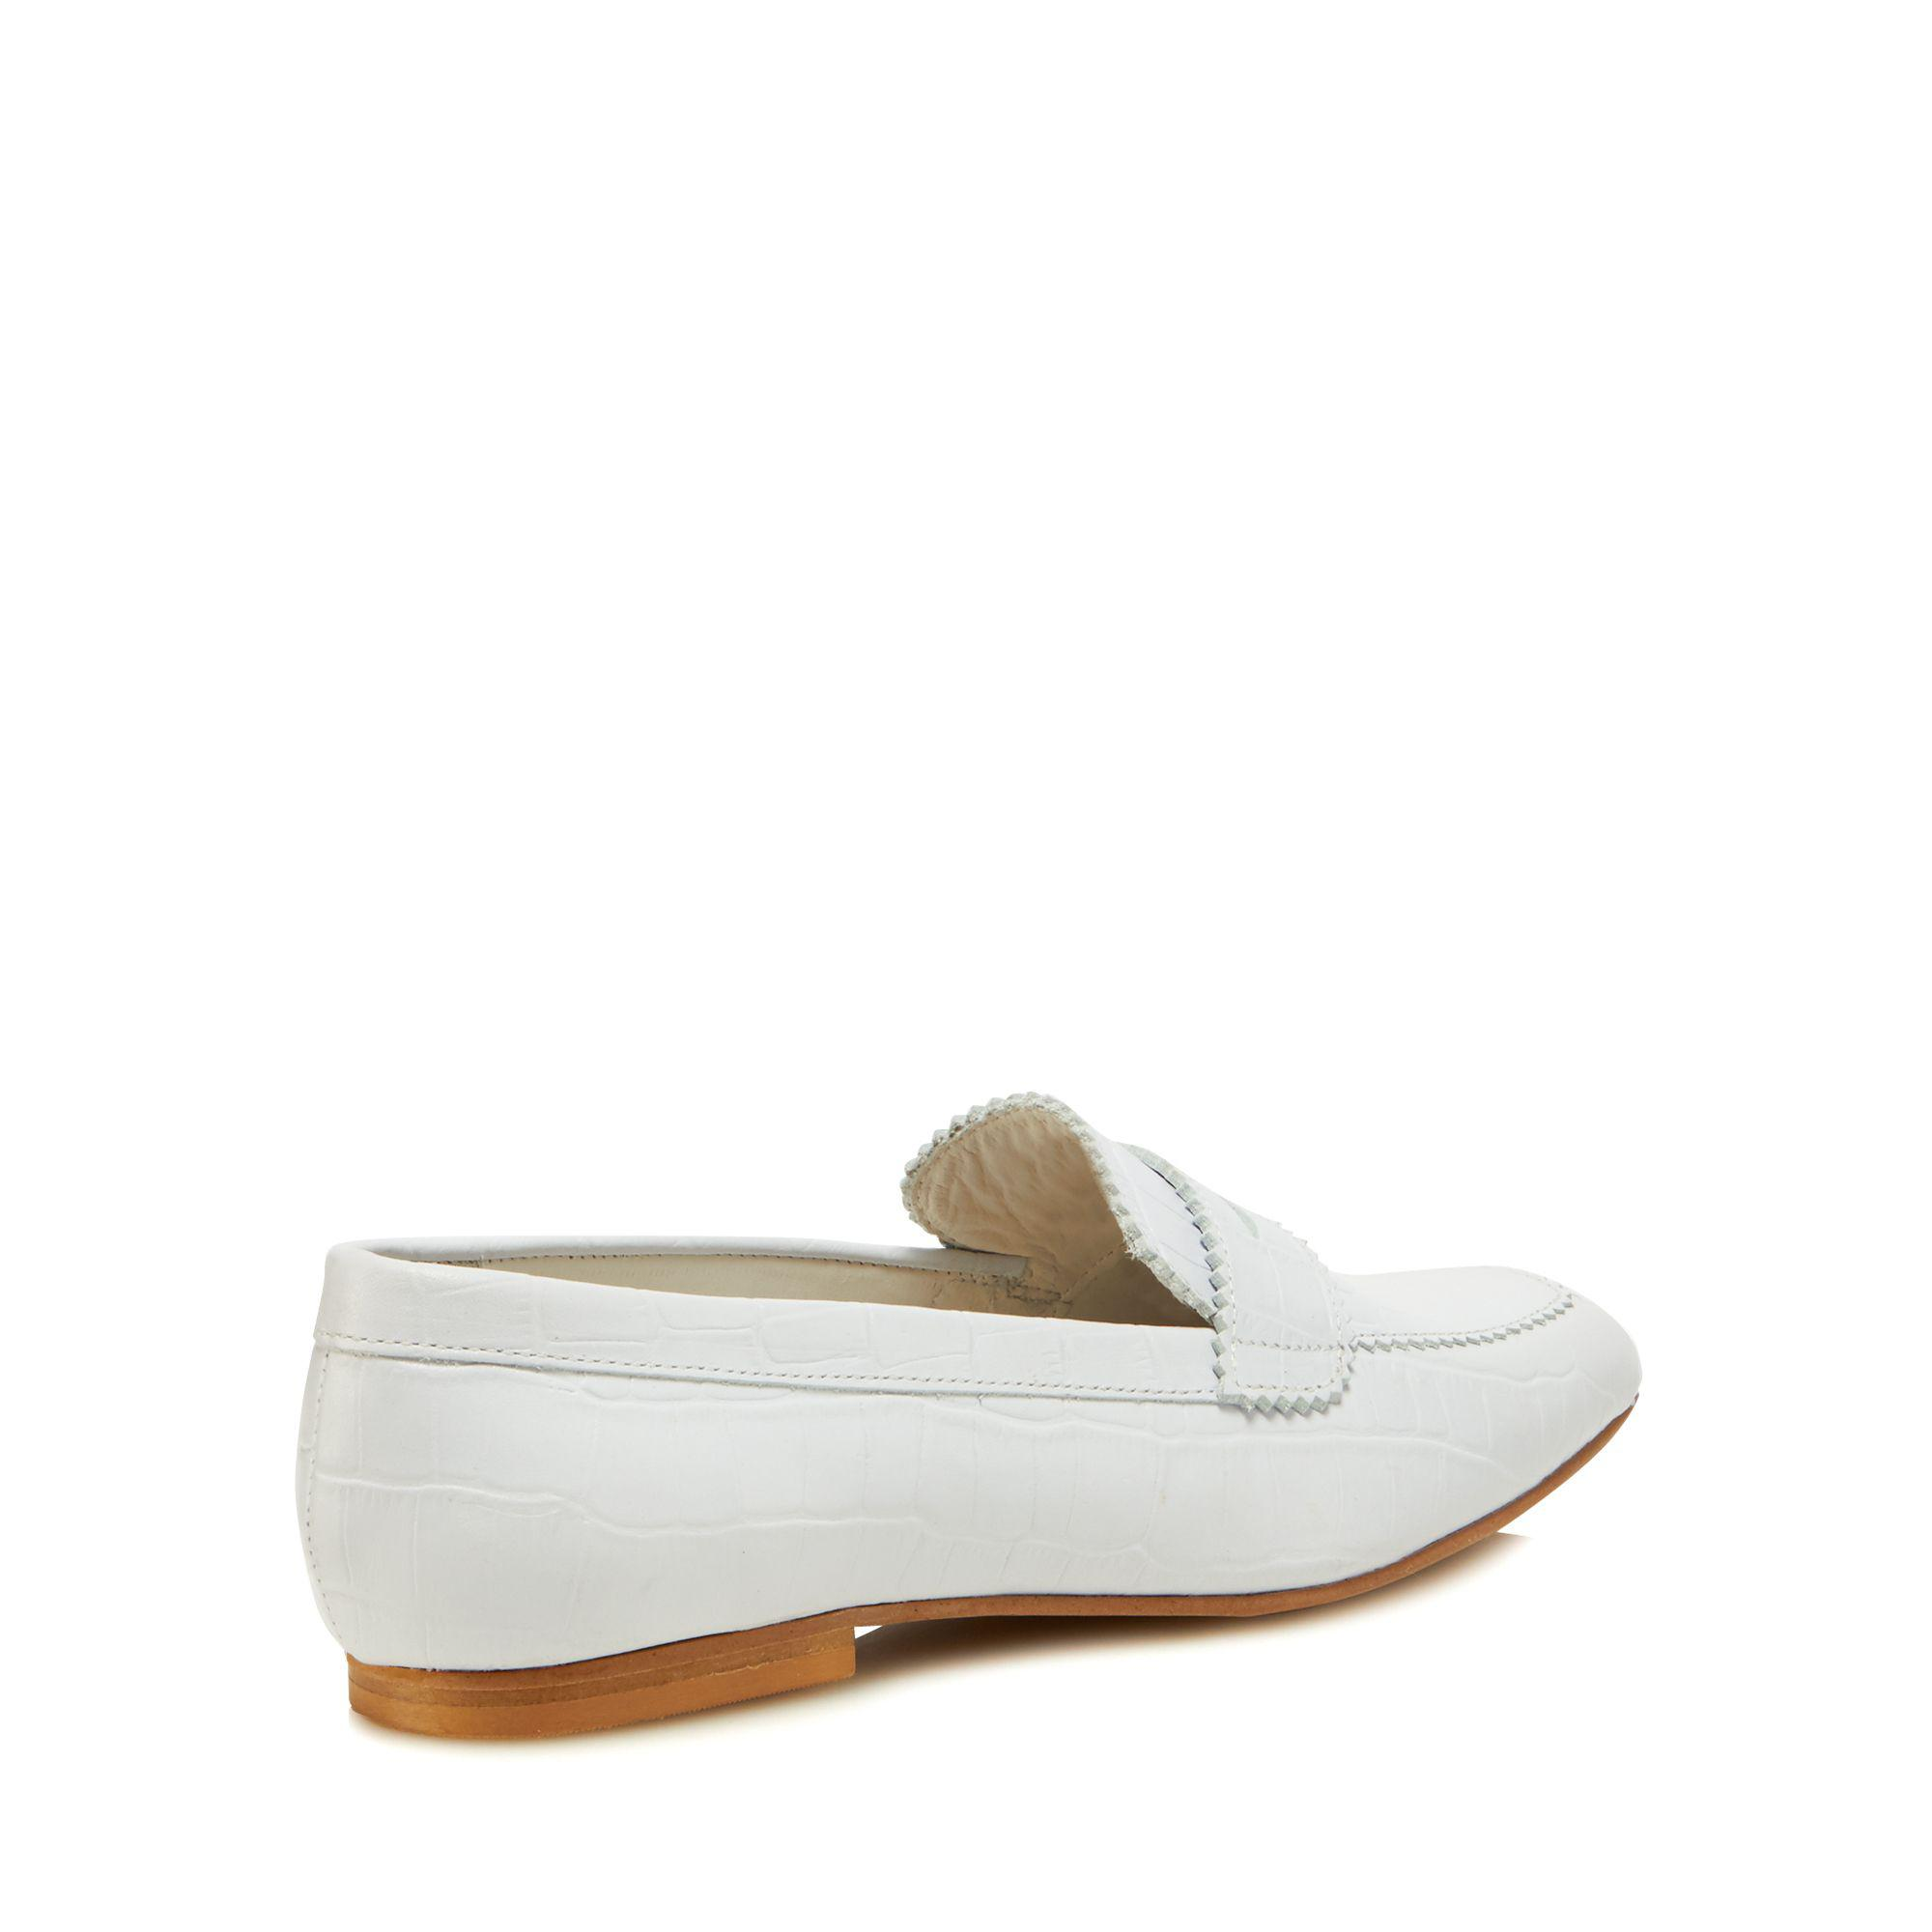 amazon sale online cheap finishline White leather 'Jaunty' loafers LF3hCJL